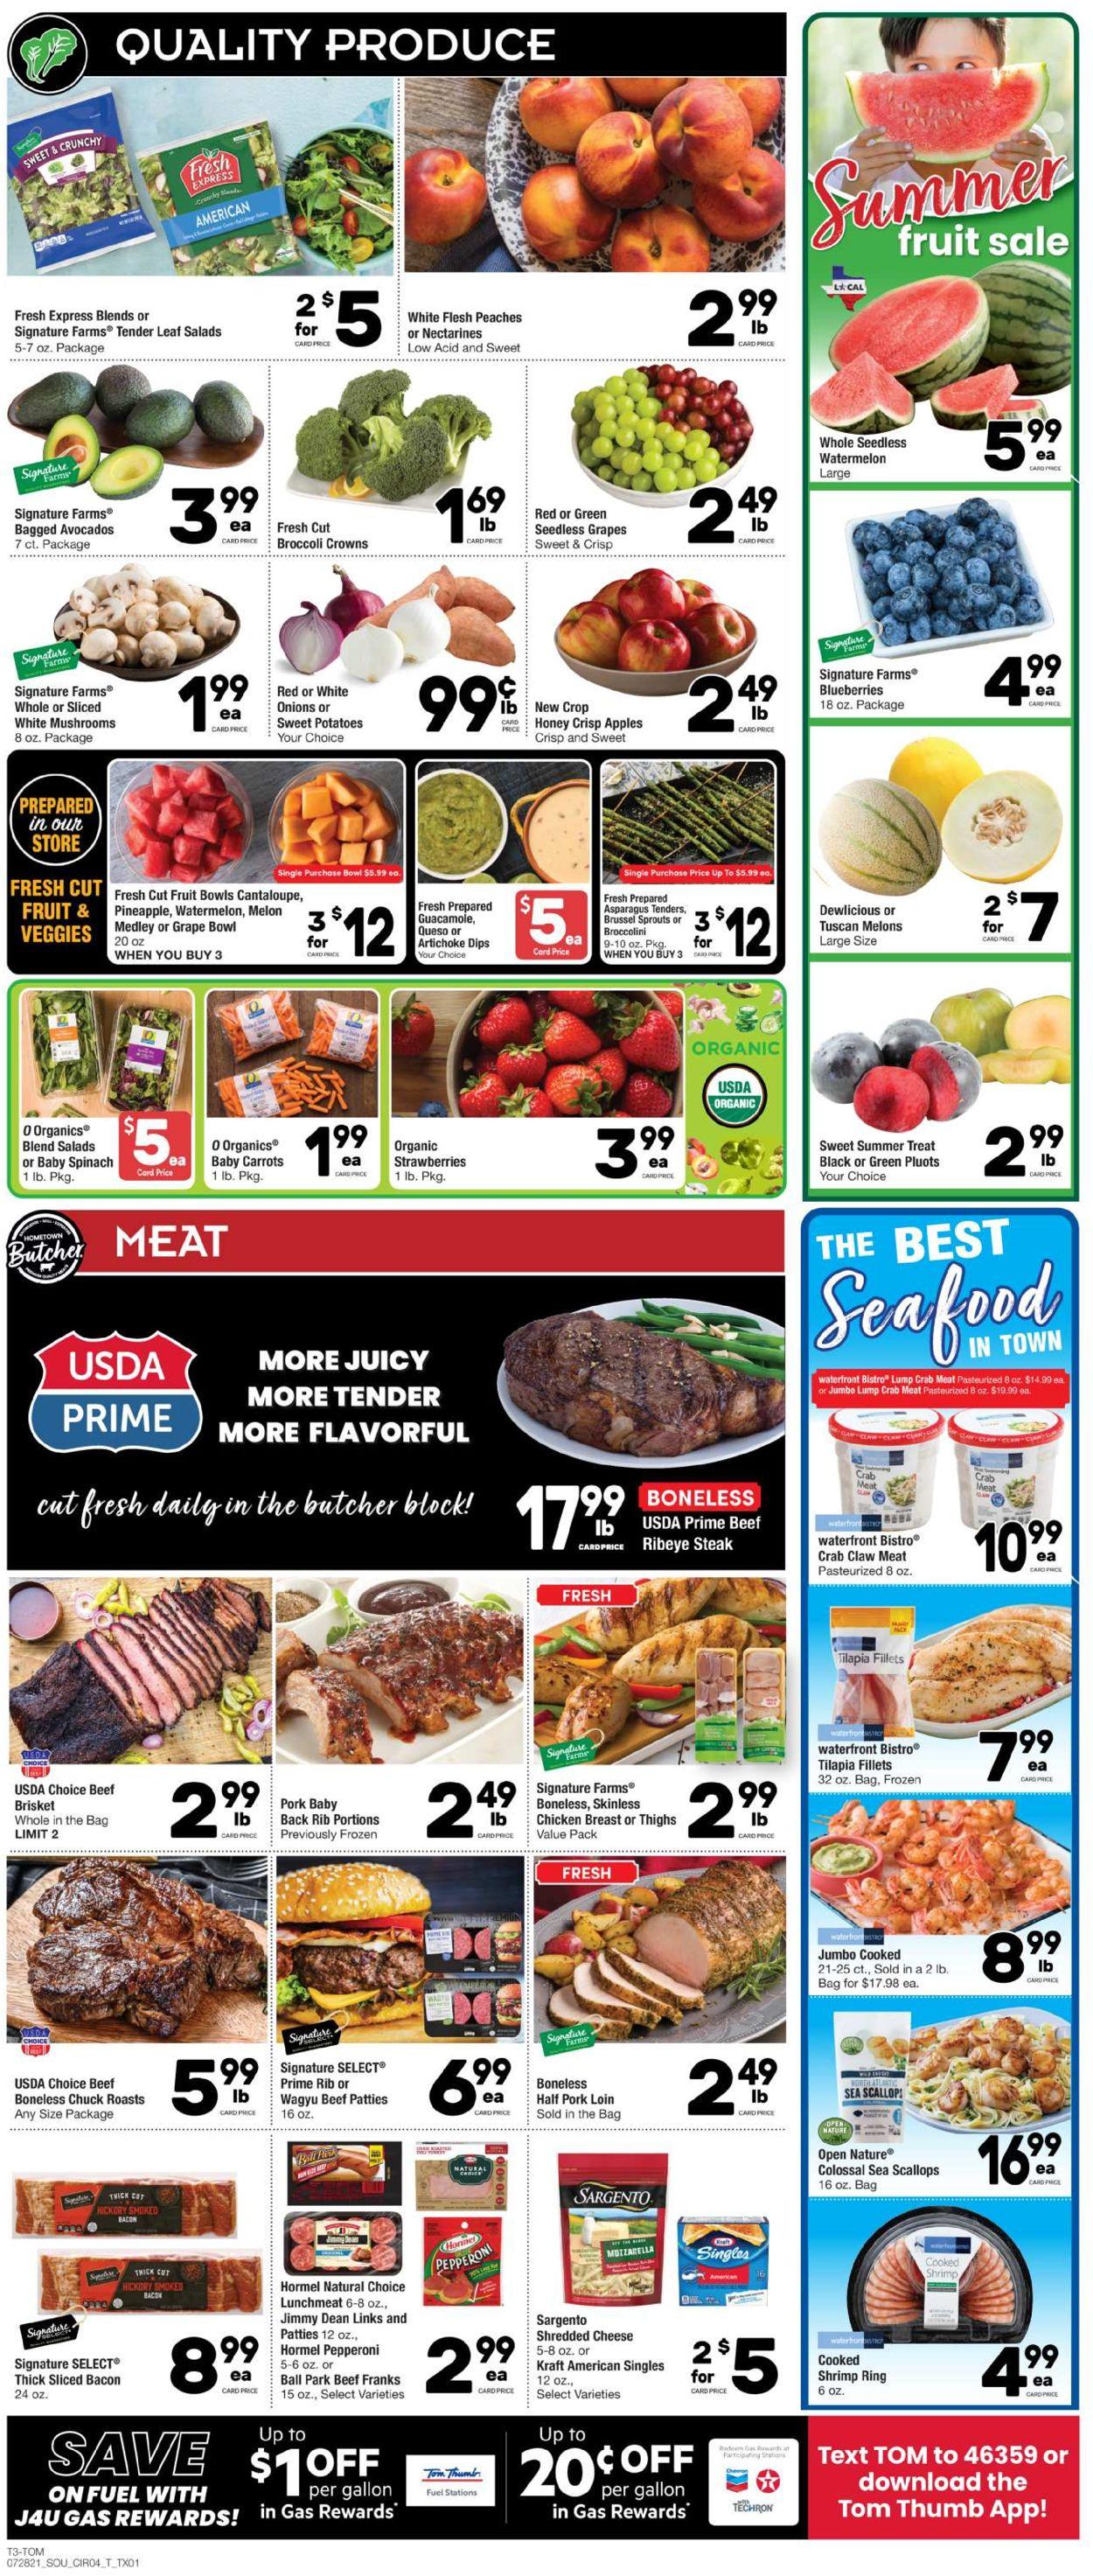 Tom Thumb Weekly Ad Circular - valid 07/28-08/03/2021 (Page 3)